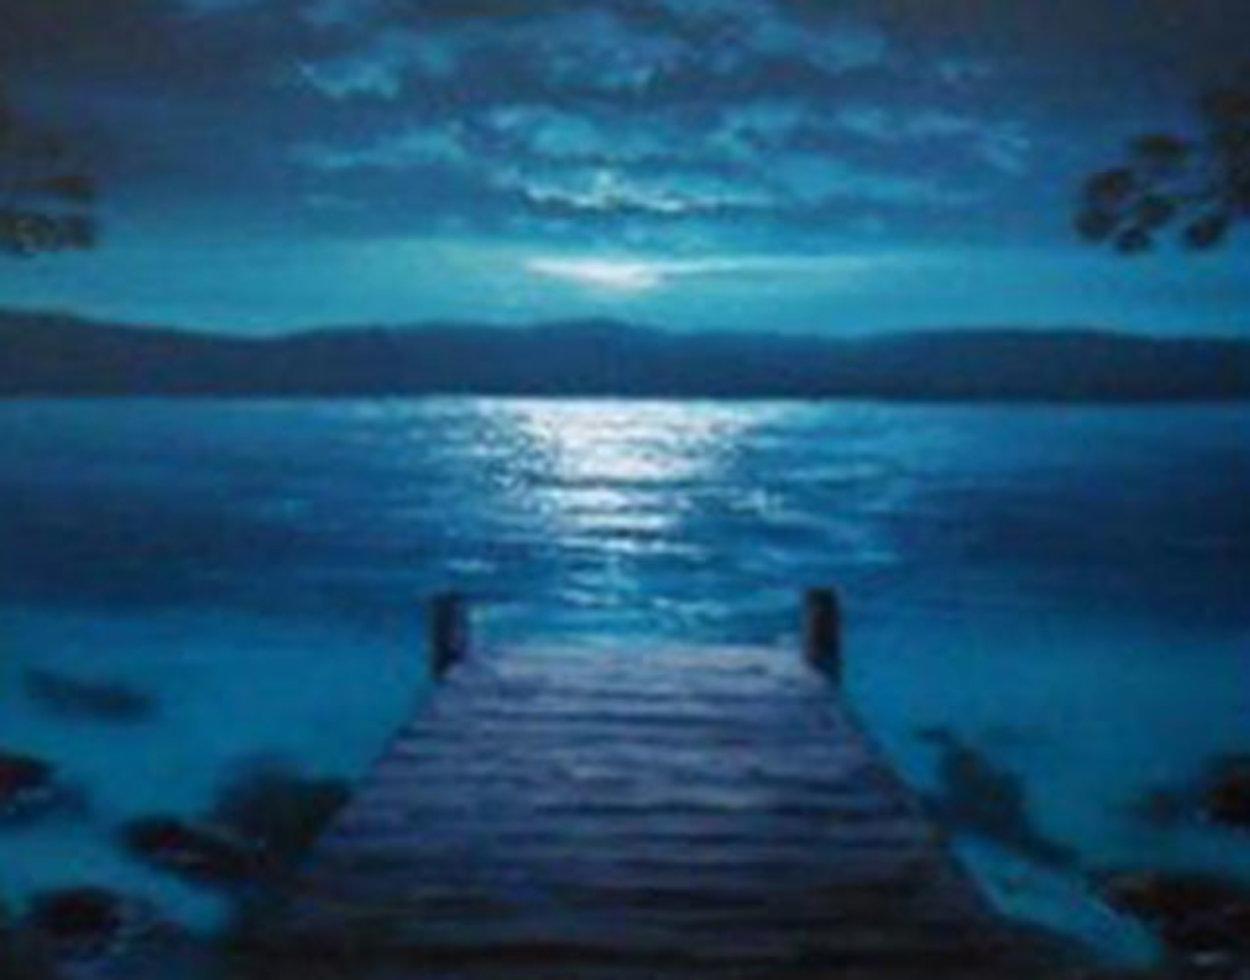 Dockside Dreams 2005 Limited Edition Print by Walfrido Garcia